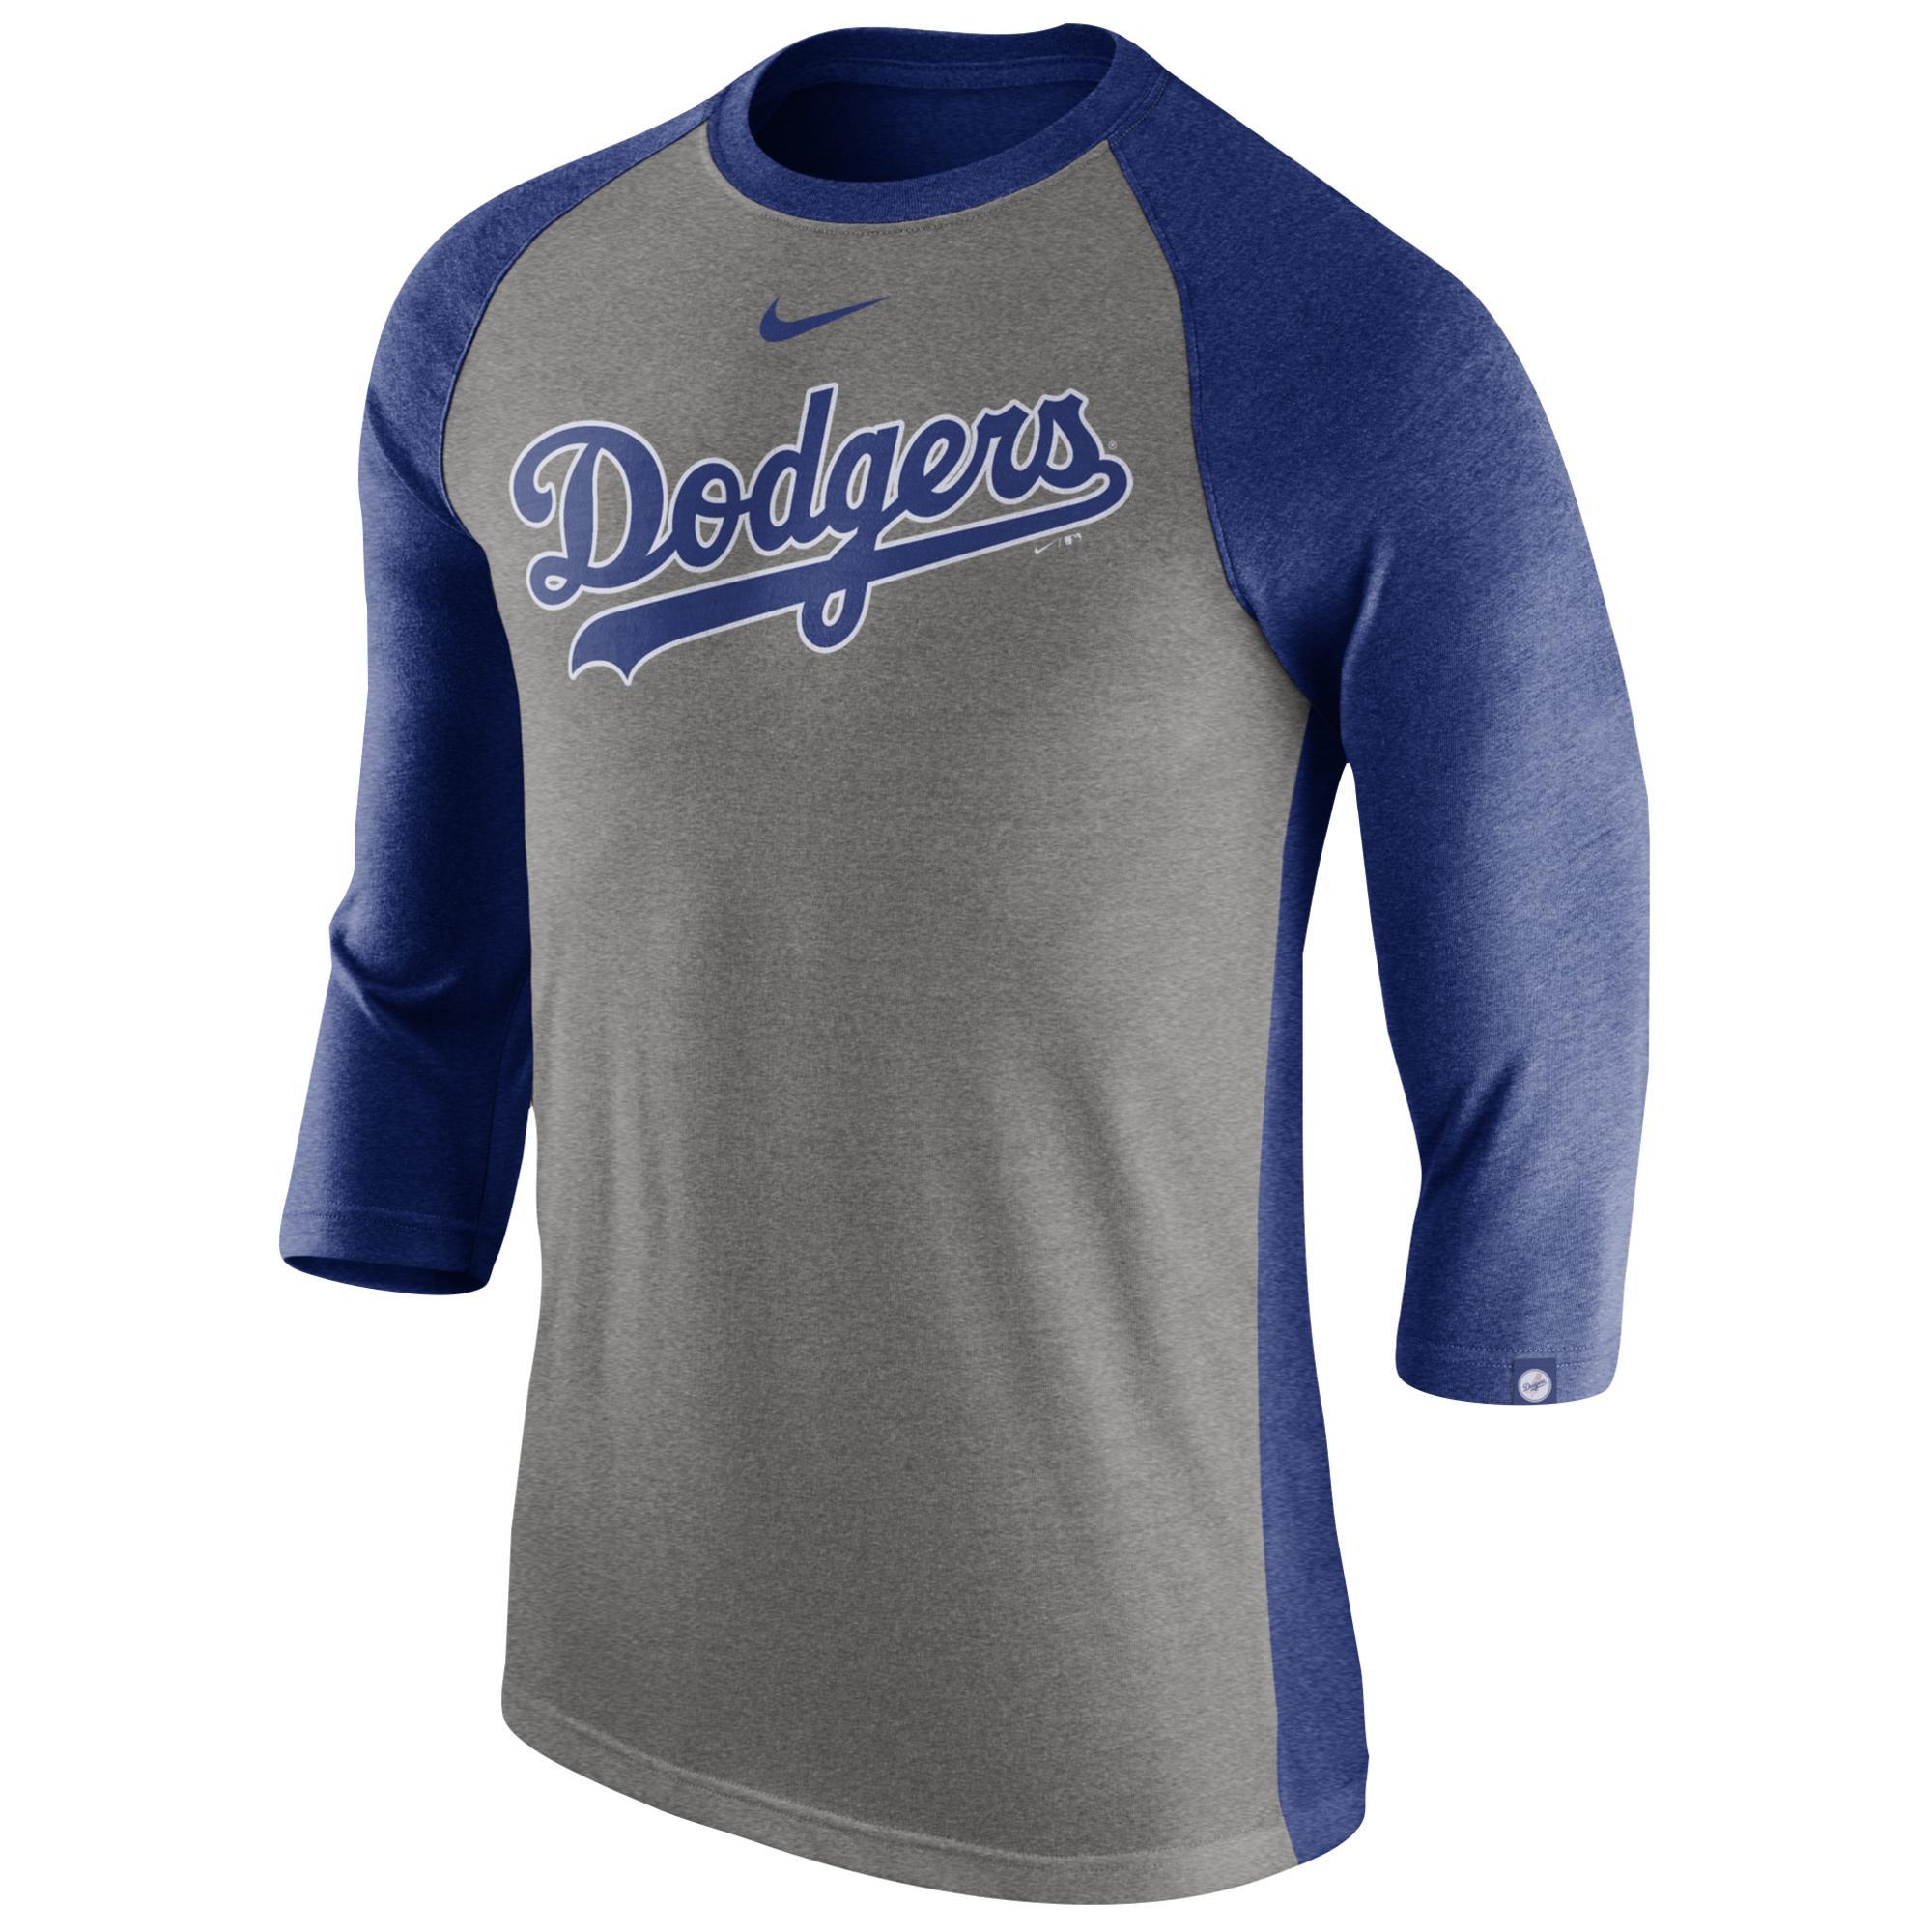 53e4c1762 Nike Los Angeles Dodgers Mlb 3 4 Raglan T-shirt in Blue for Men - Lyst